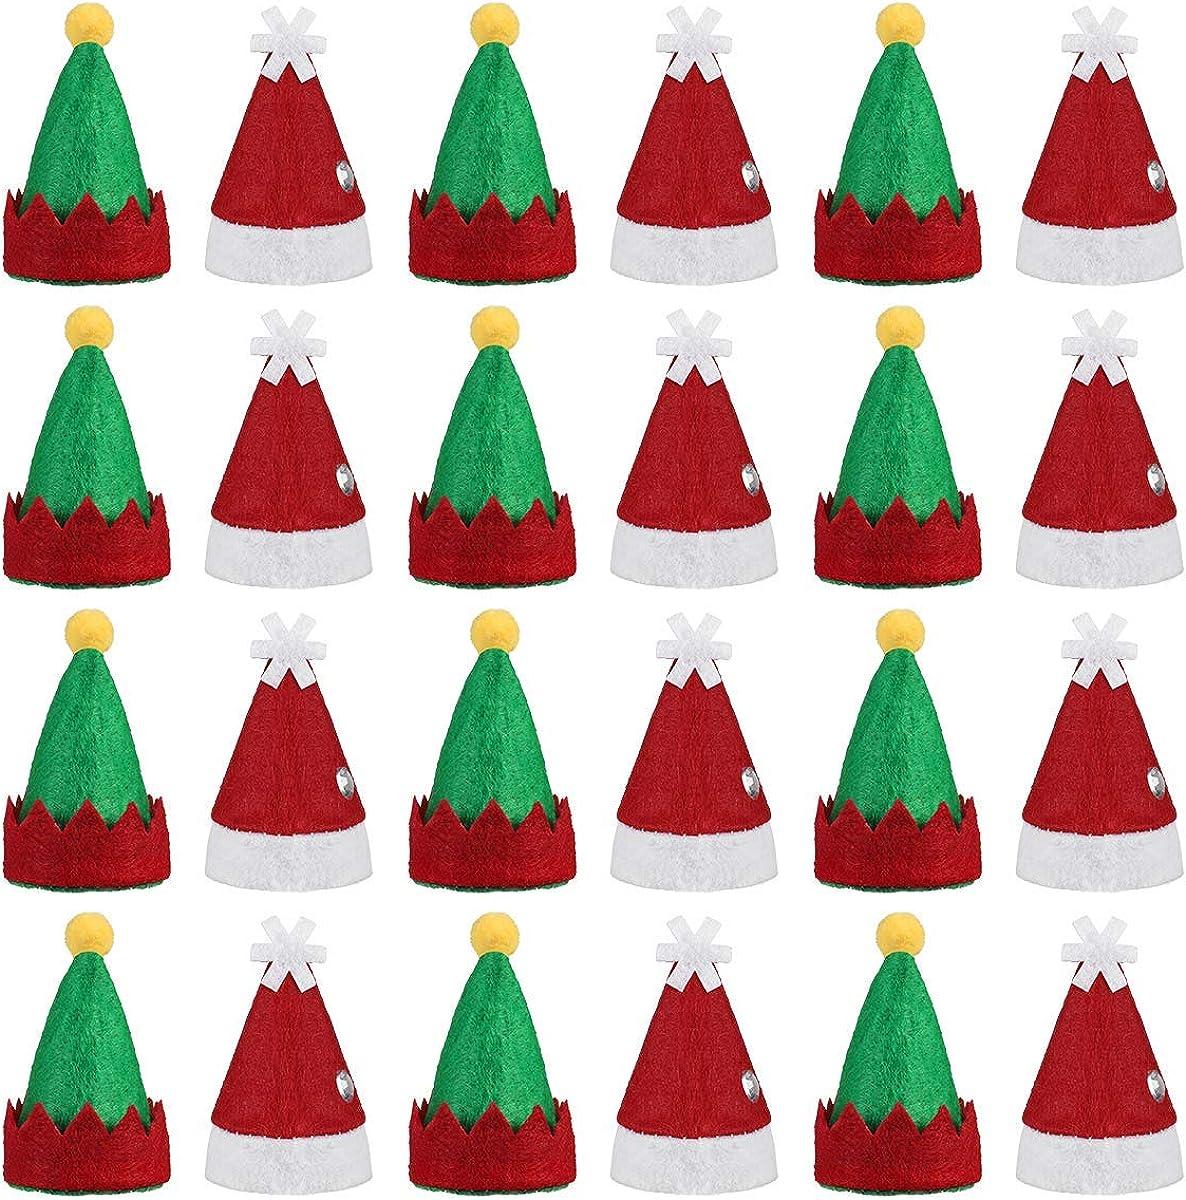 Amosfun 48pcs Mini DIY Christmas Hat Elf Christmas Cap Lollipop Top Wraps Toppers Wine Bottle Cap for Lollipop Candy Cover Decorations Craft